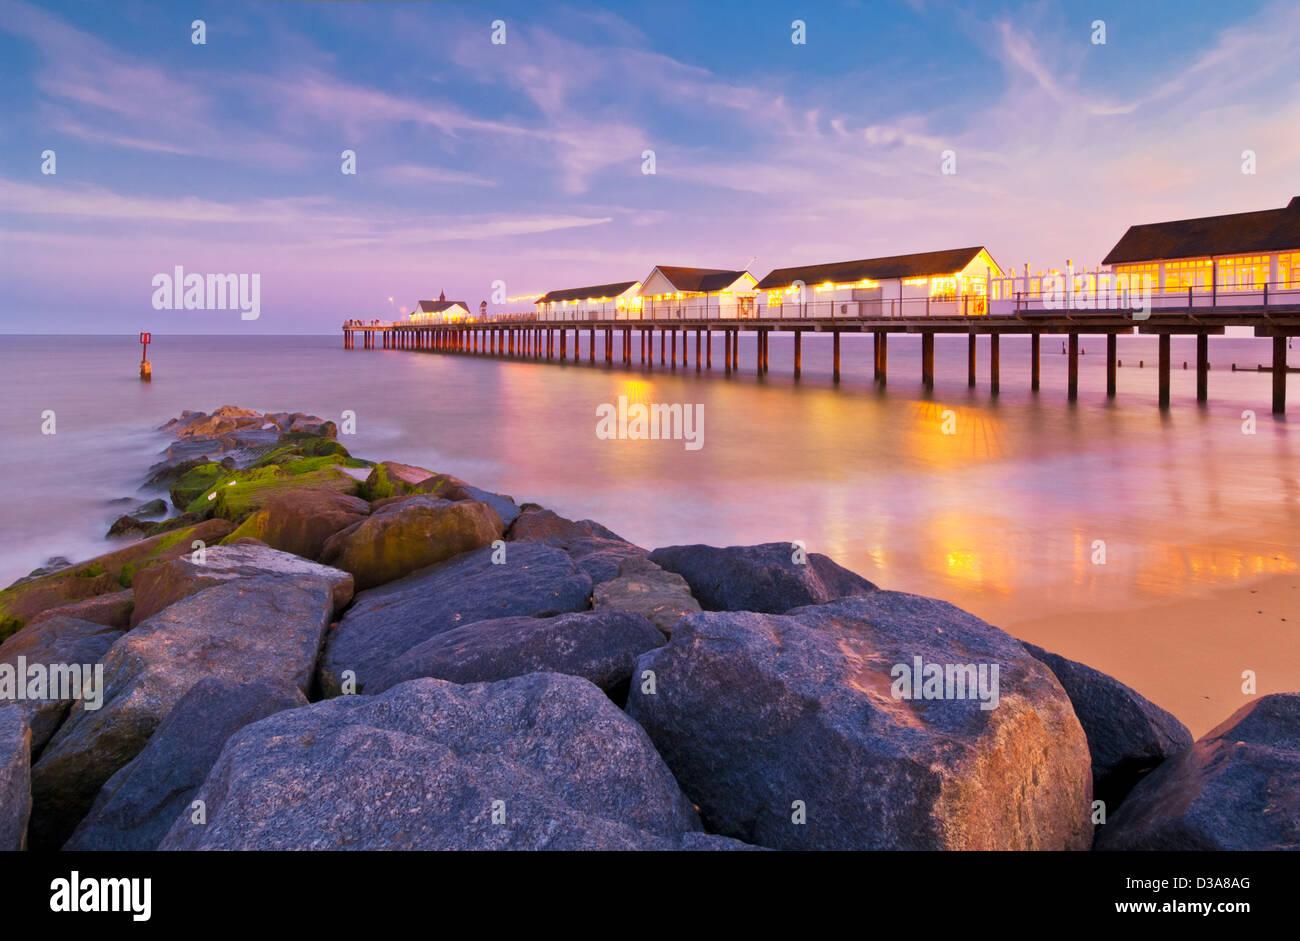 Southwold pier at sunset, Southwold, Suffolk, East Anglia, England, GB, UK, EU, Europe - Stock Image